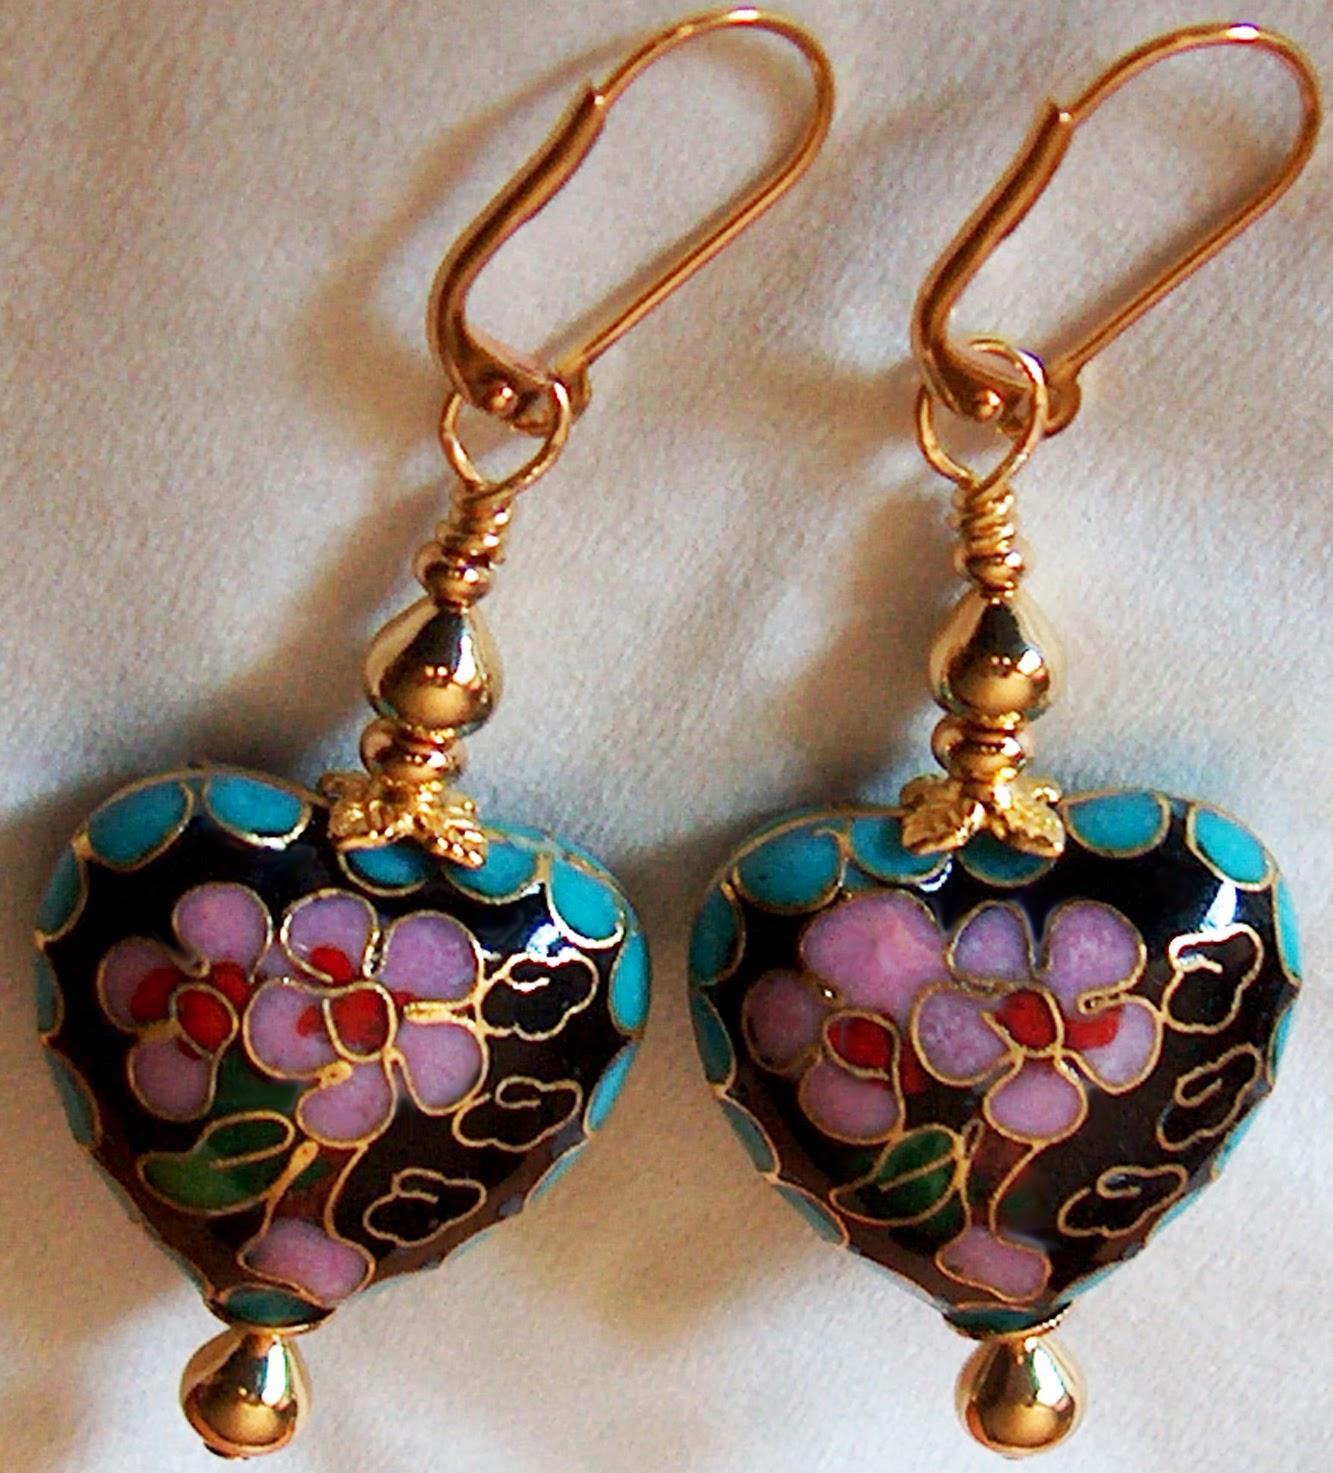 Antique Cloisonne Earrings Kirsten USA